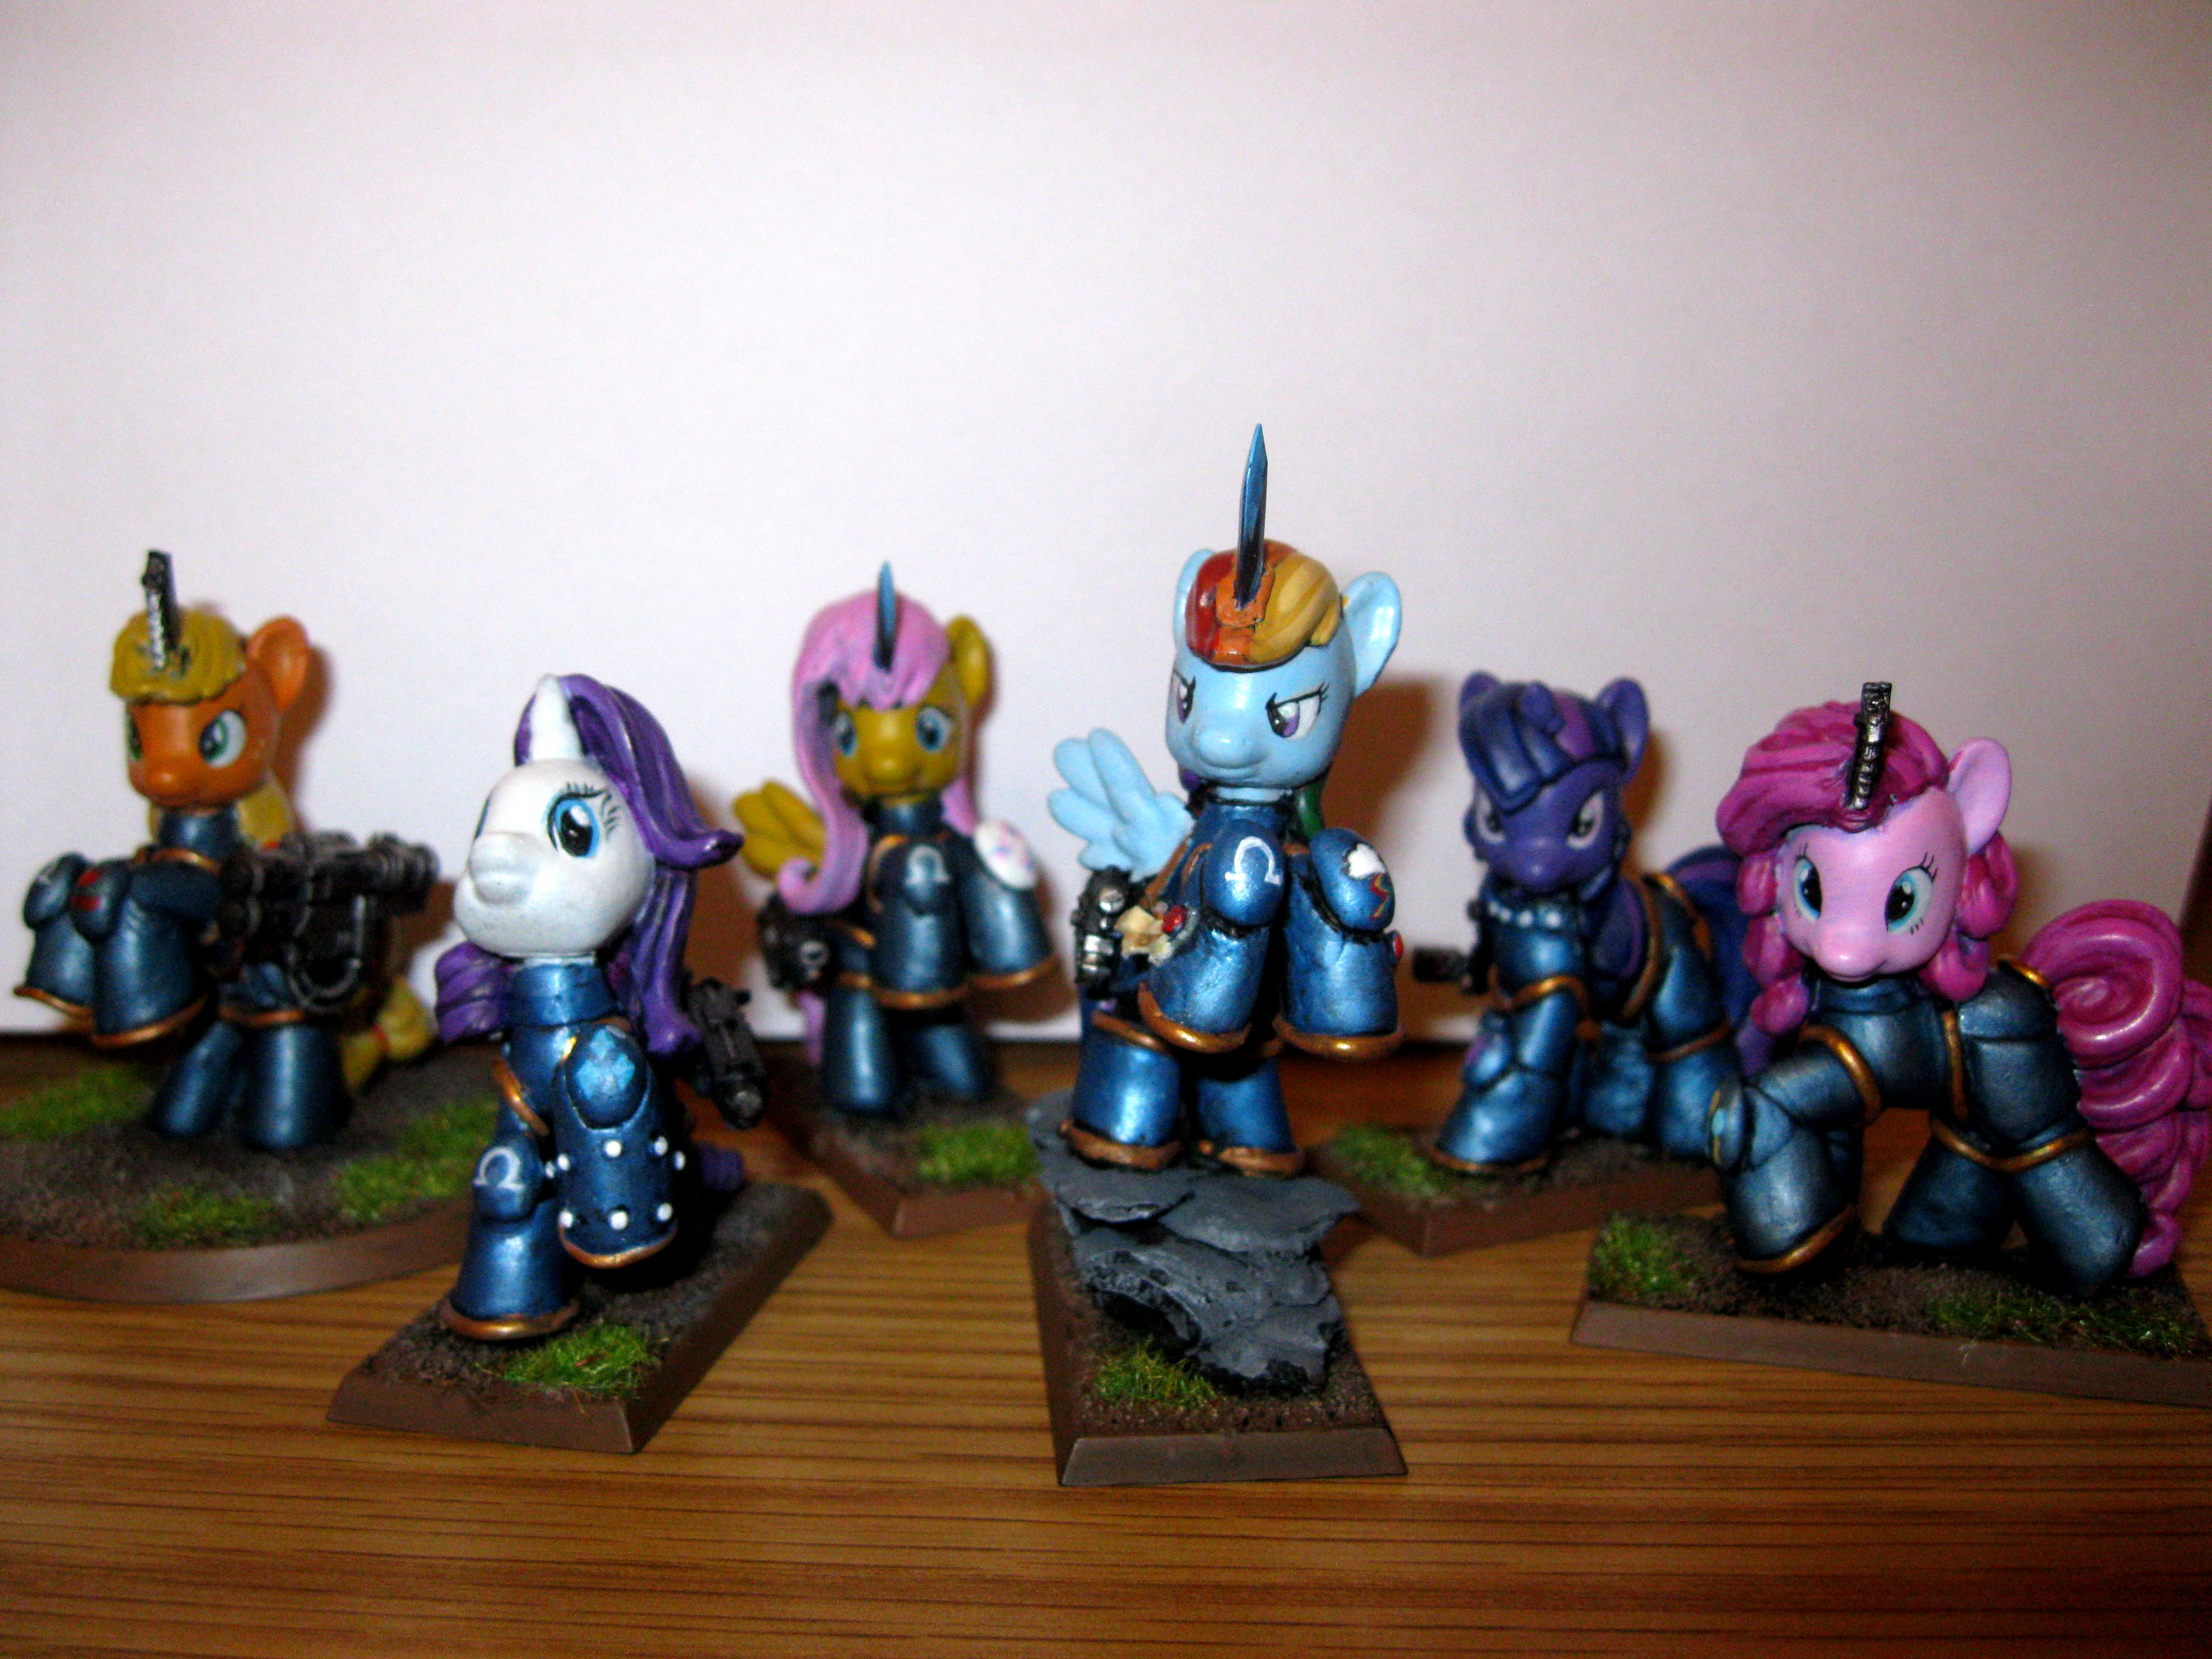 Cute, Humor, My Little Pony, Space Marines, Stupid